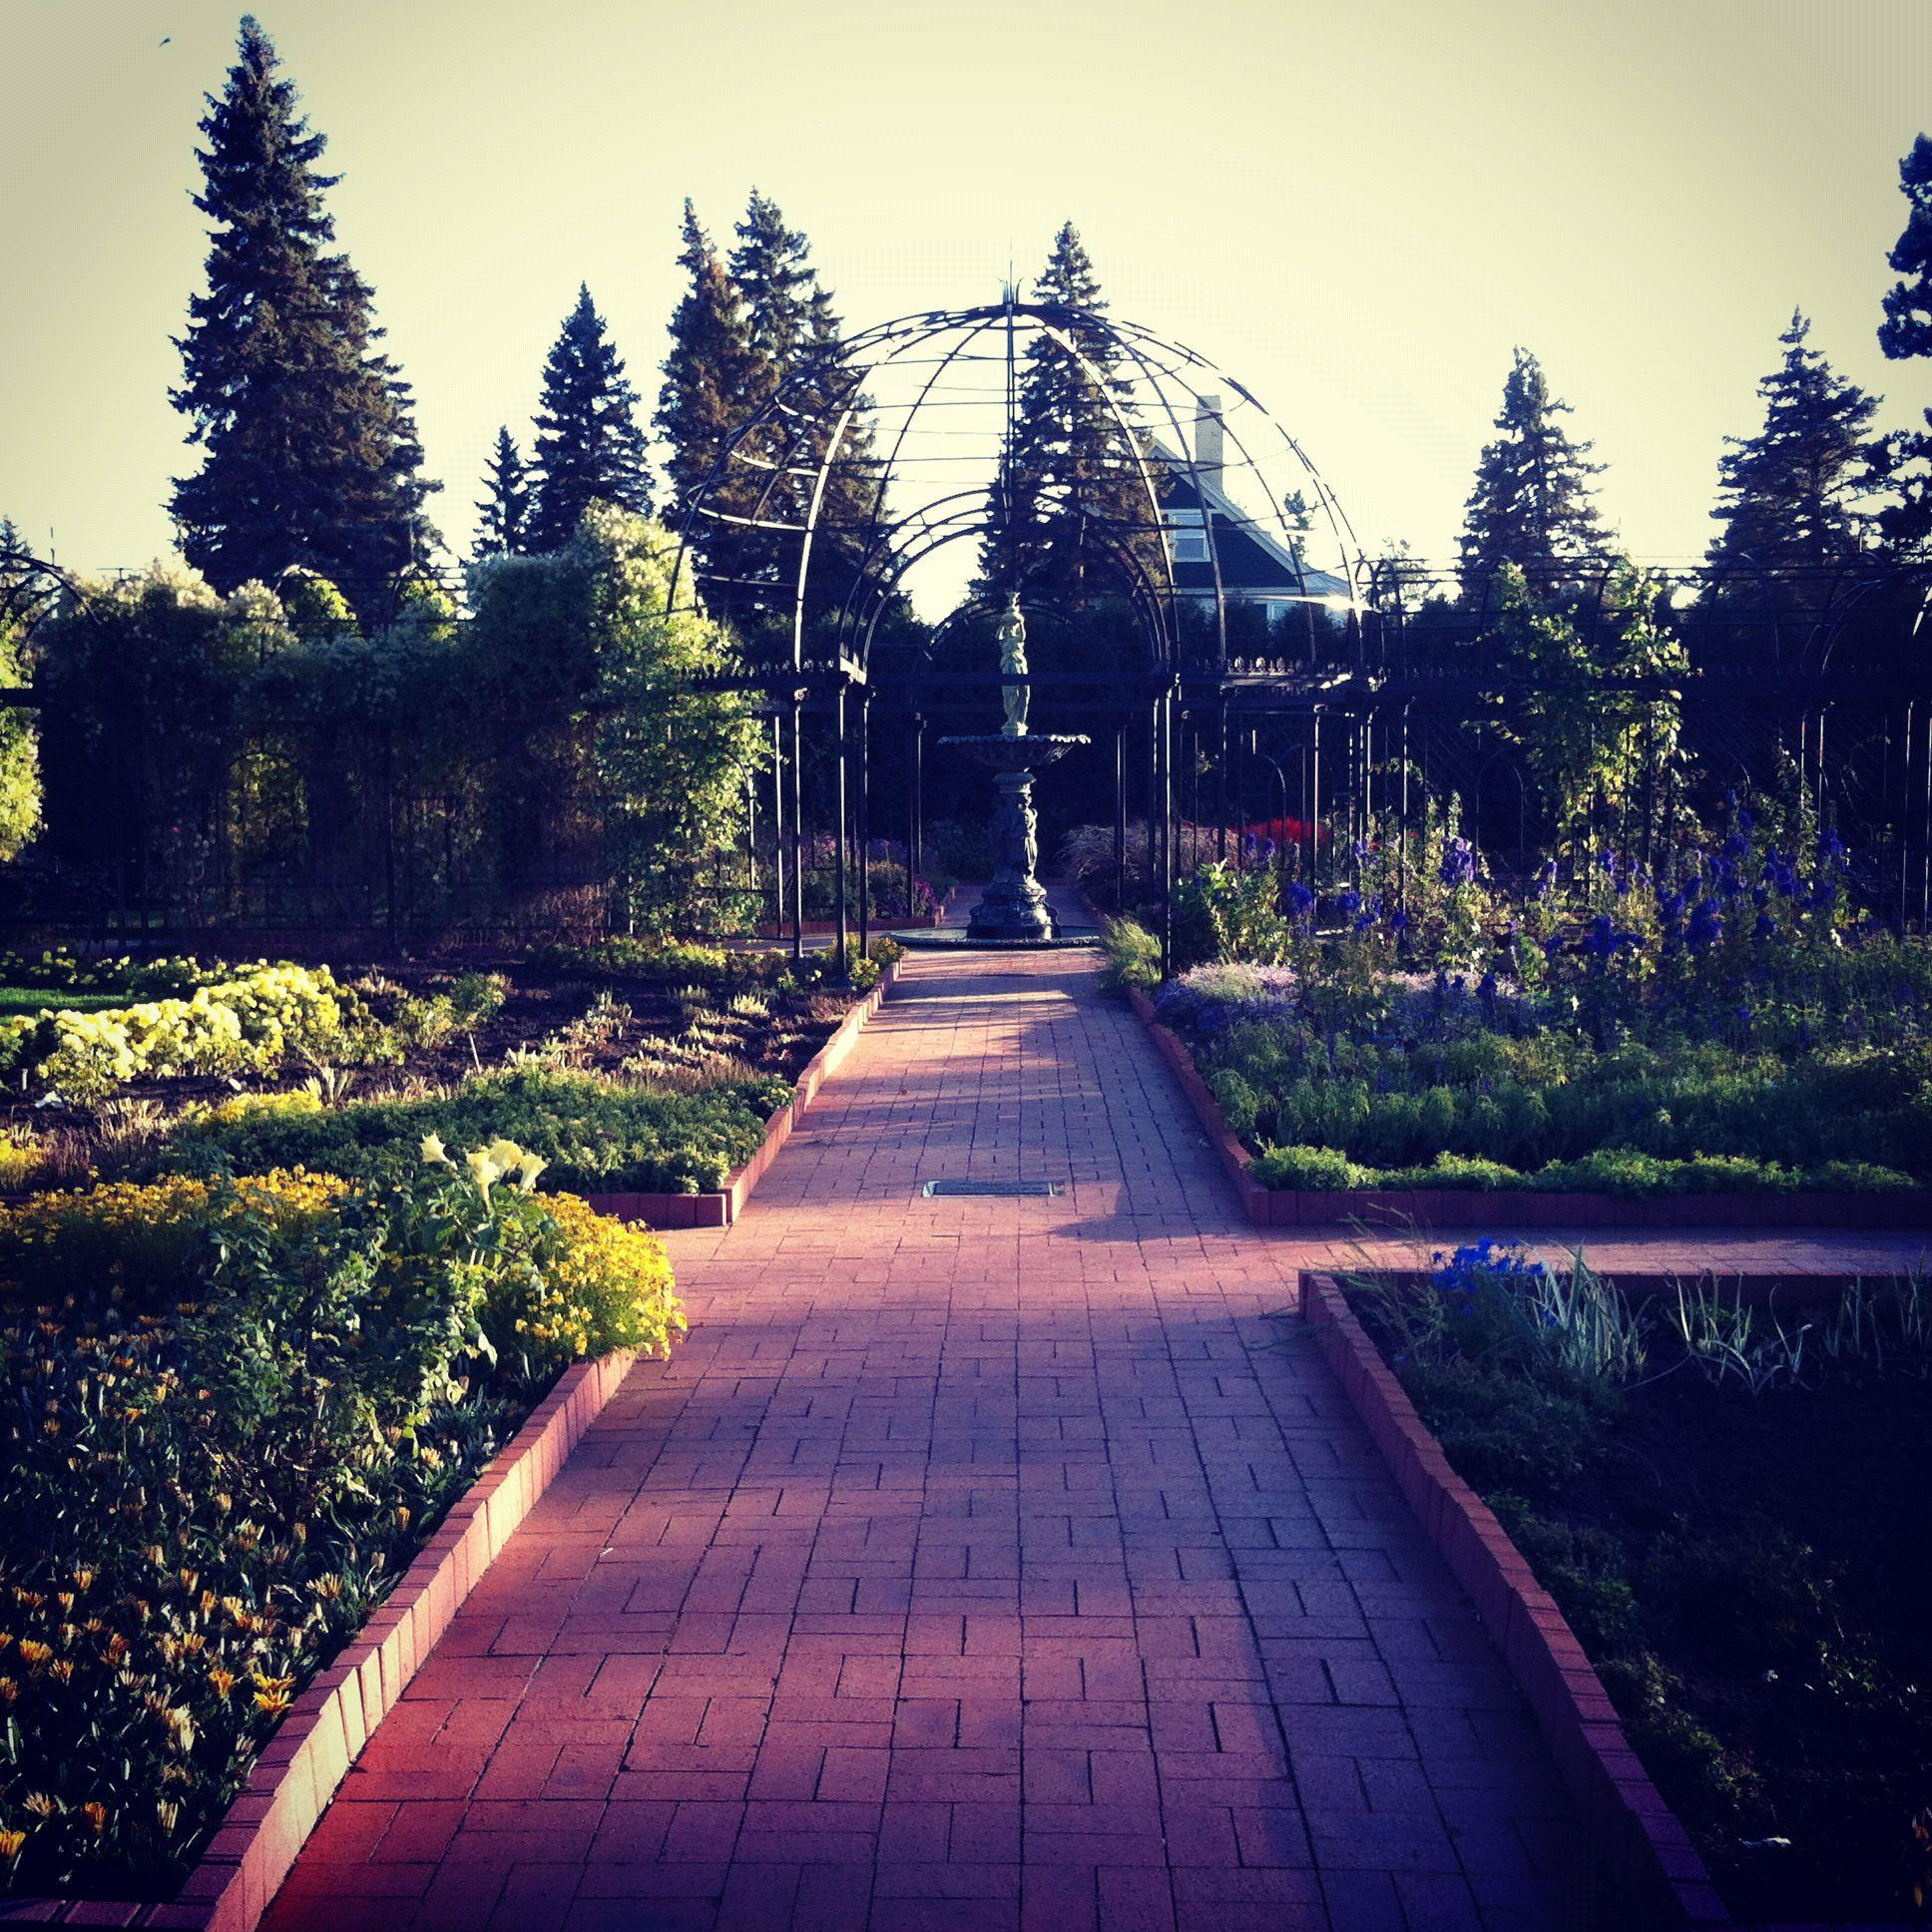 9dd14d5ae01715eb7d0d5e12cc6a797c - Best Time To Visit Munsinger Gardens